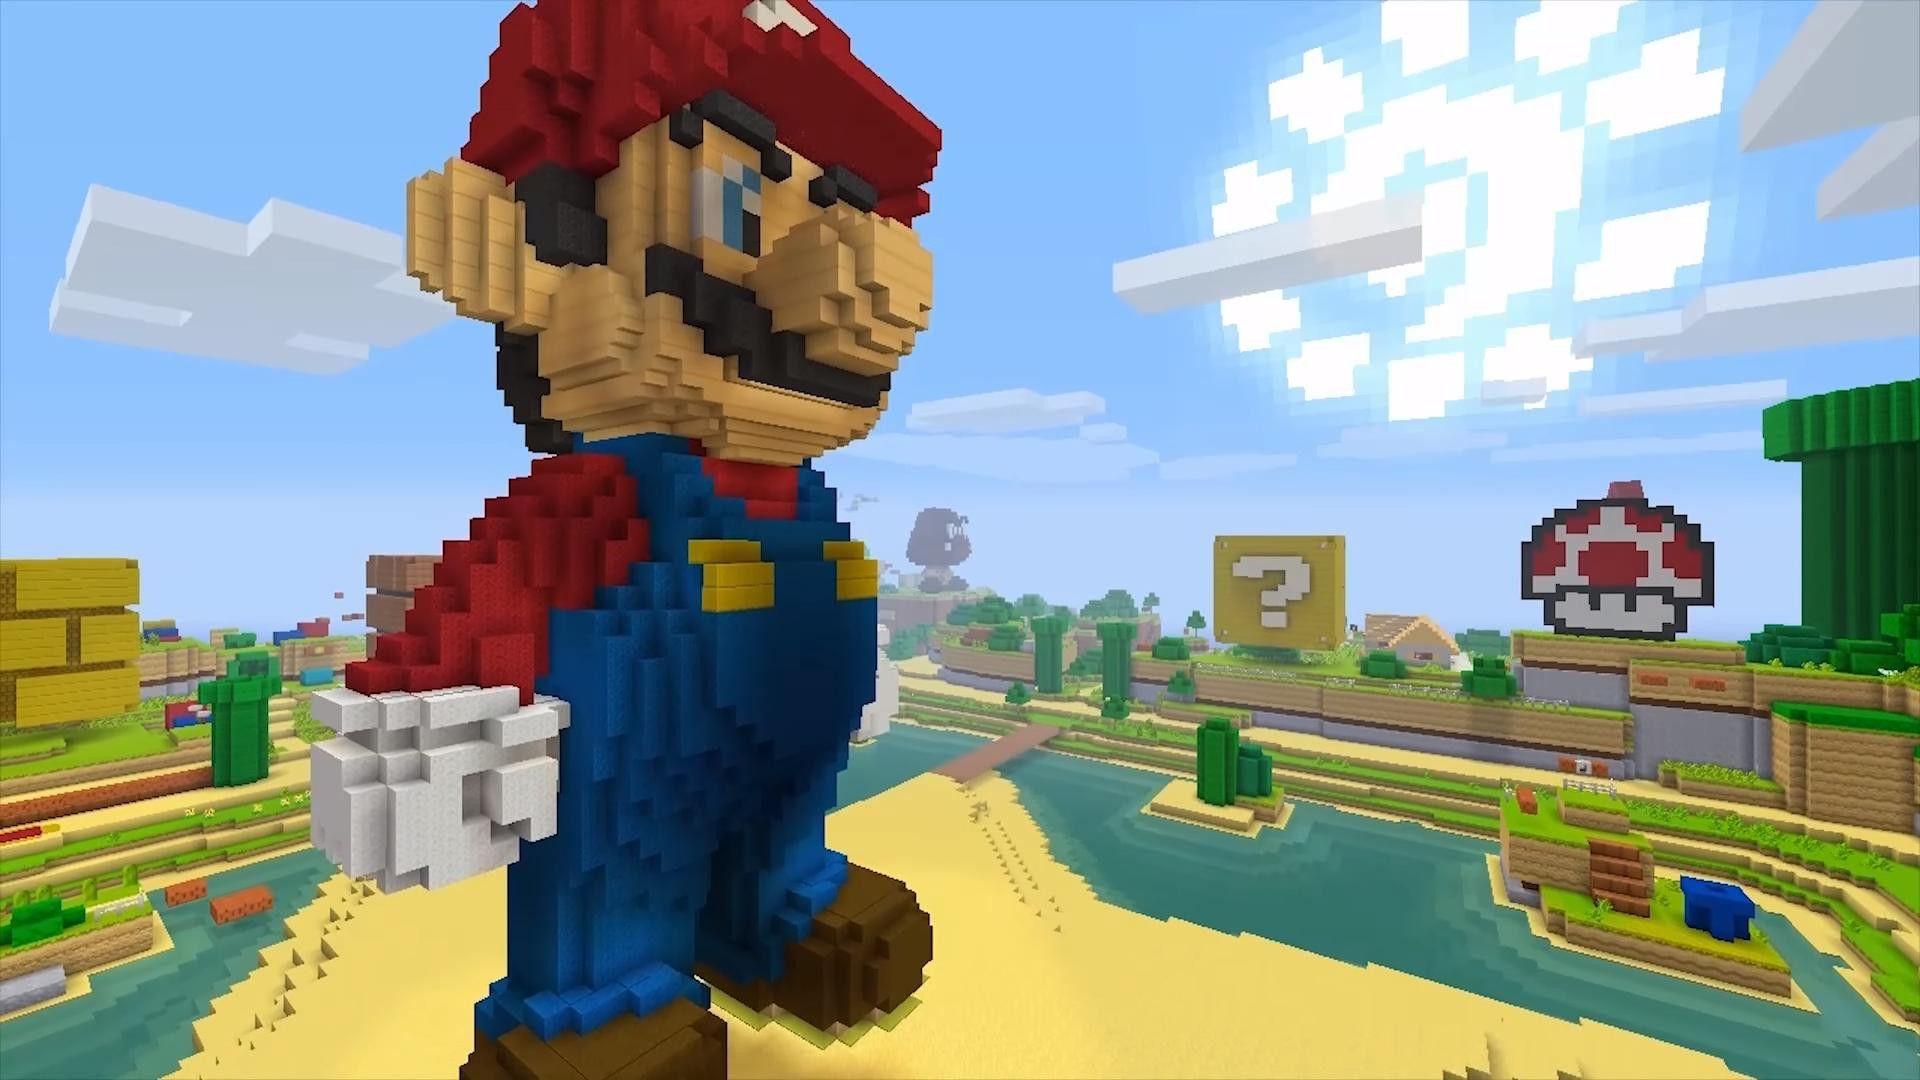 ScovatiEastereggdelnuovoaggiornamentoSuperMariodi - Minecraft hauser video